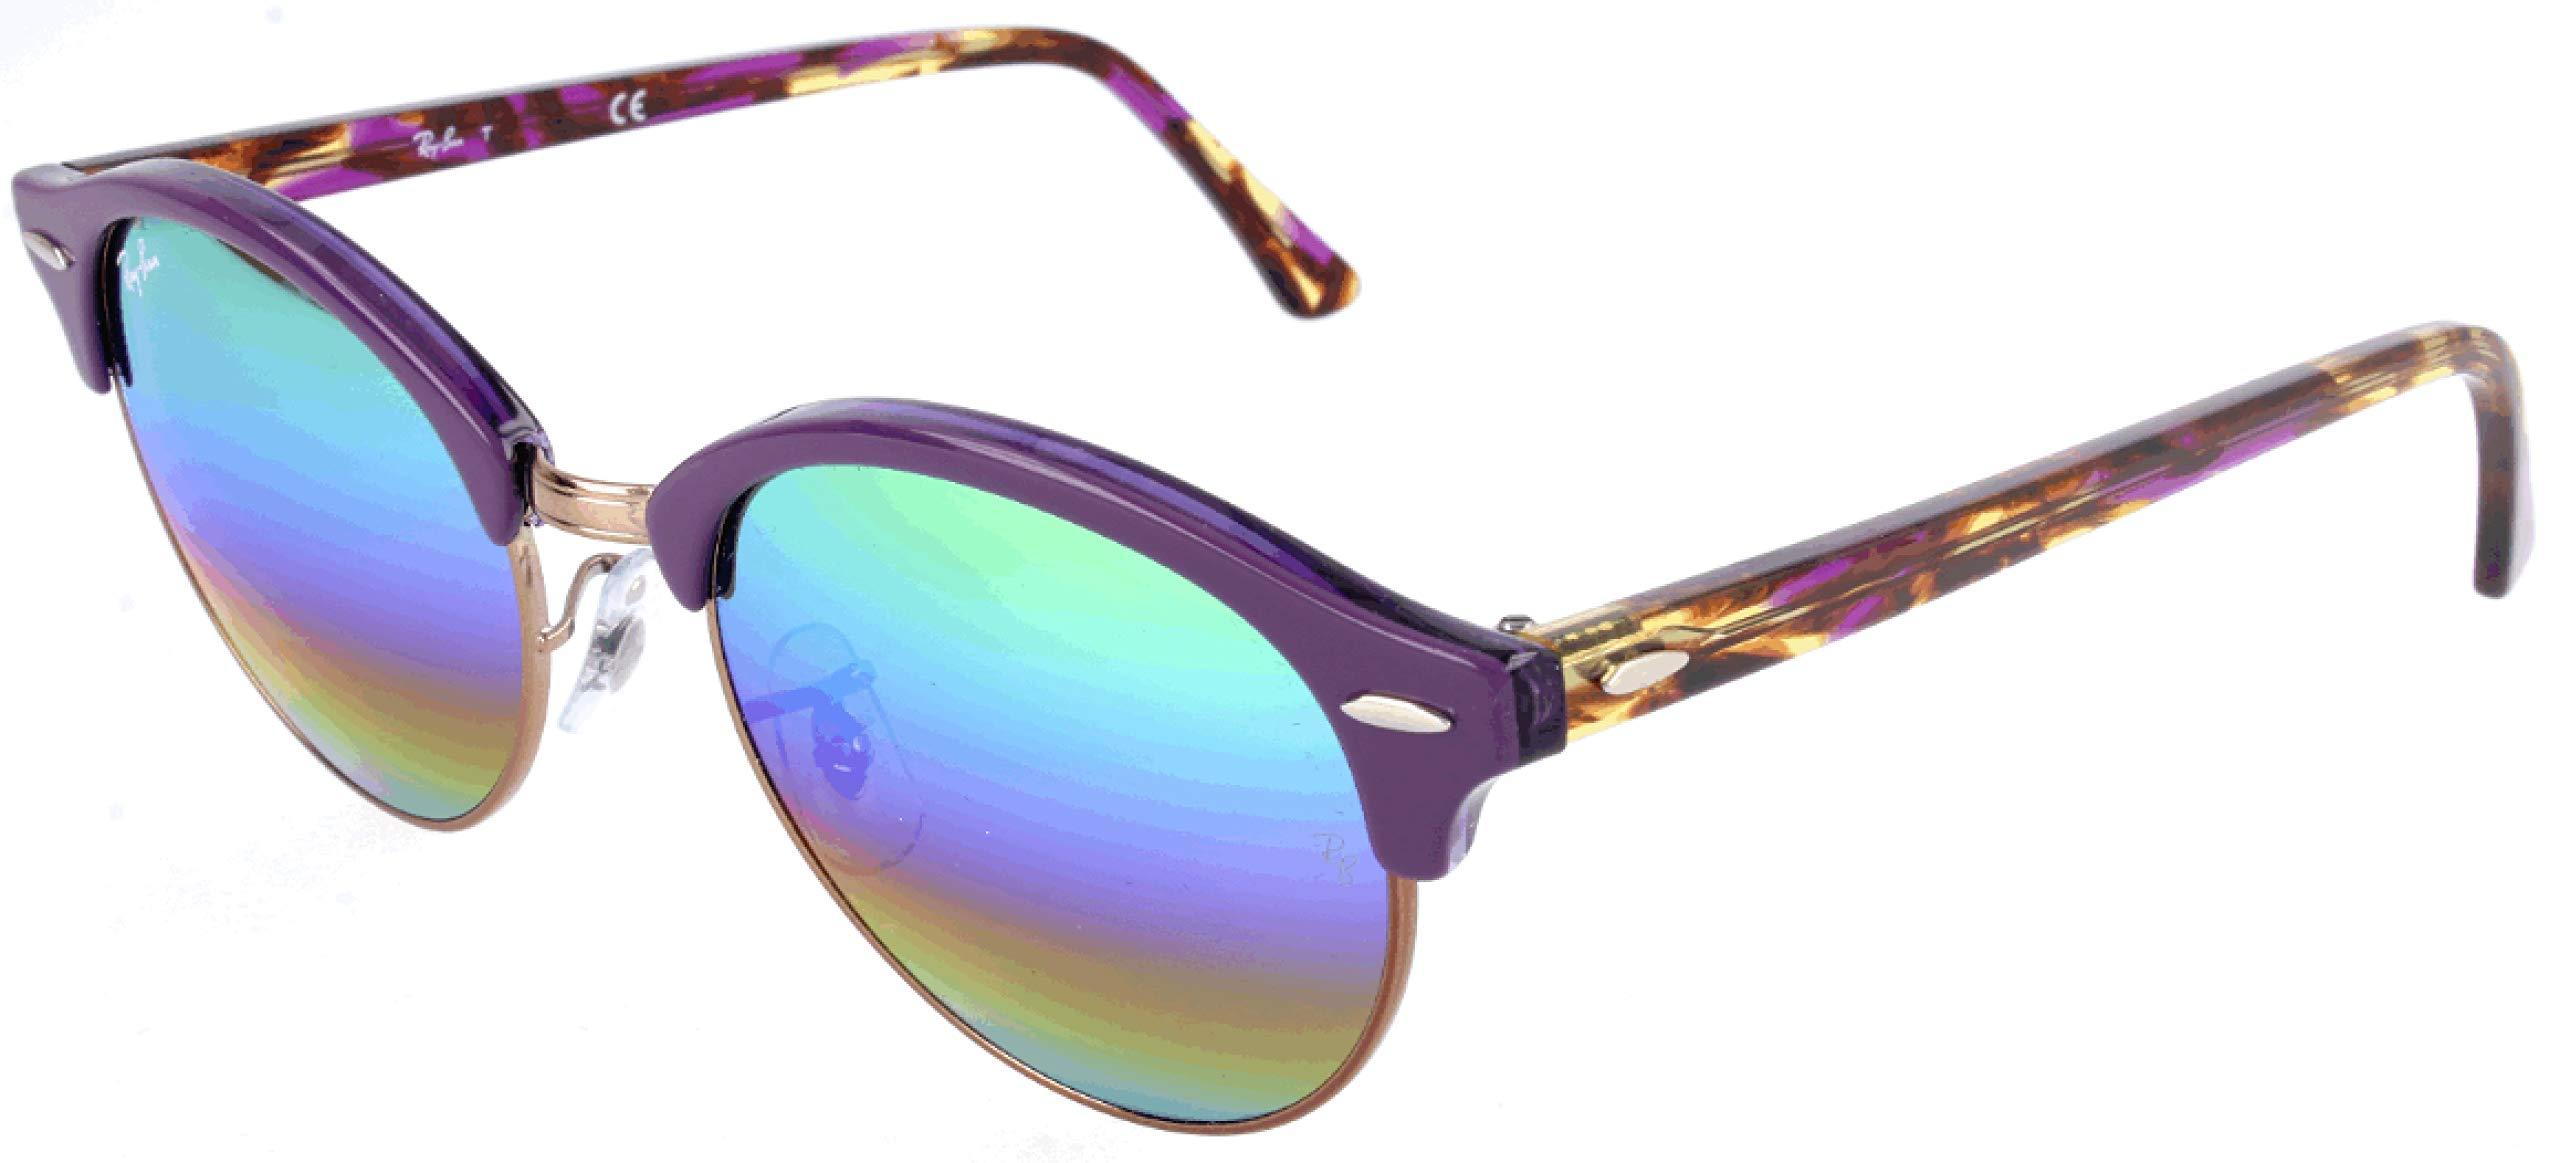 Ray-Ban Unisex RB4246 1221C3 Sunglasses, Top Violet on Transparent Violet